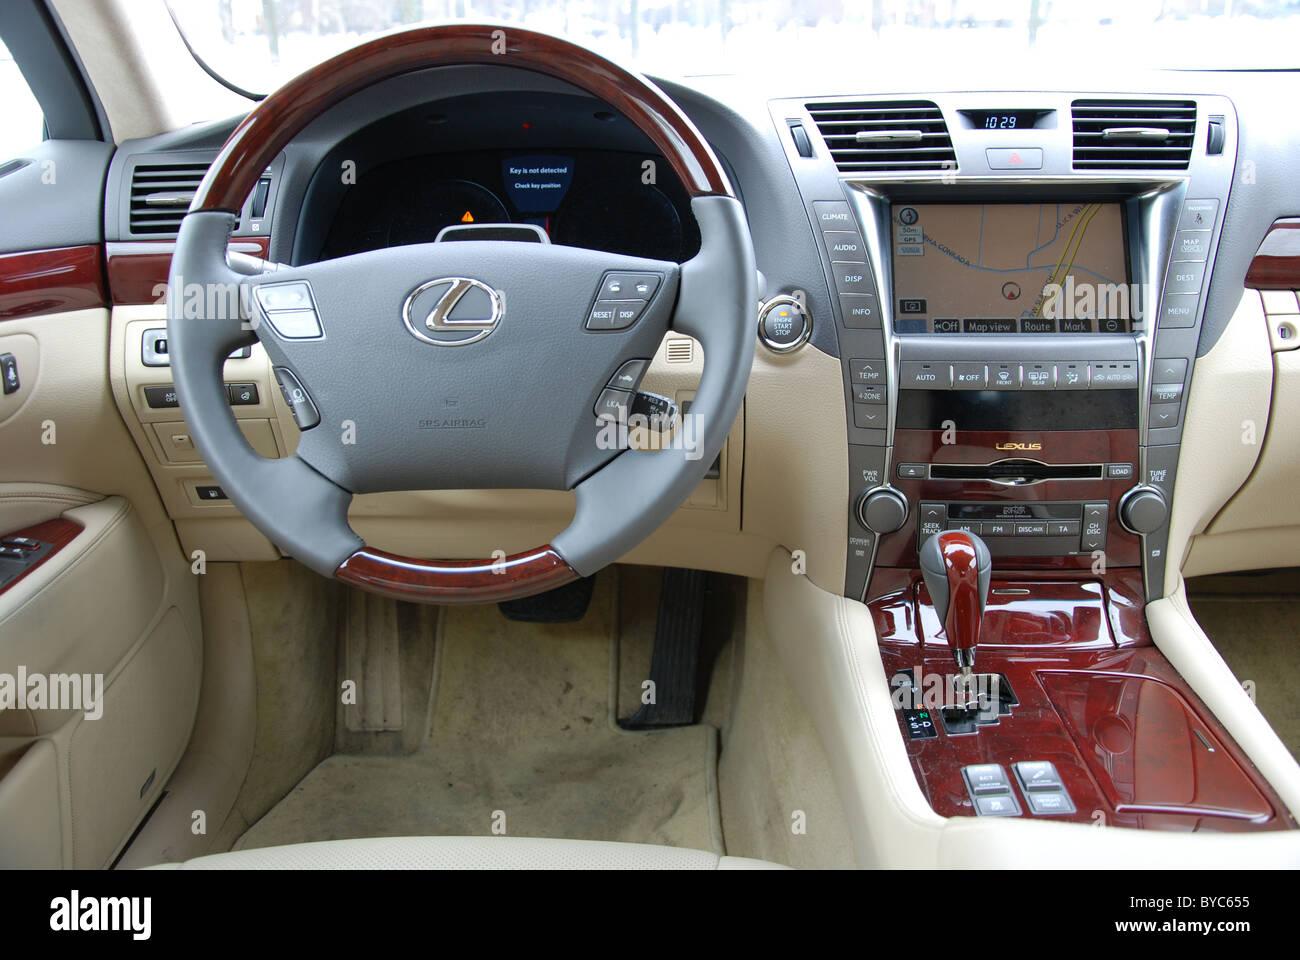 Lexus Ls 460 Awd My 2006 White Premium Japanese Luxurious